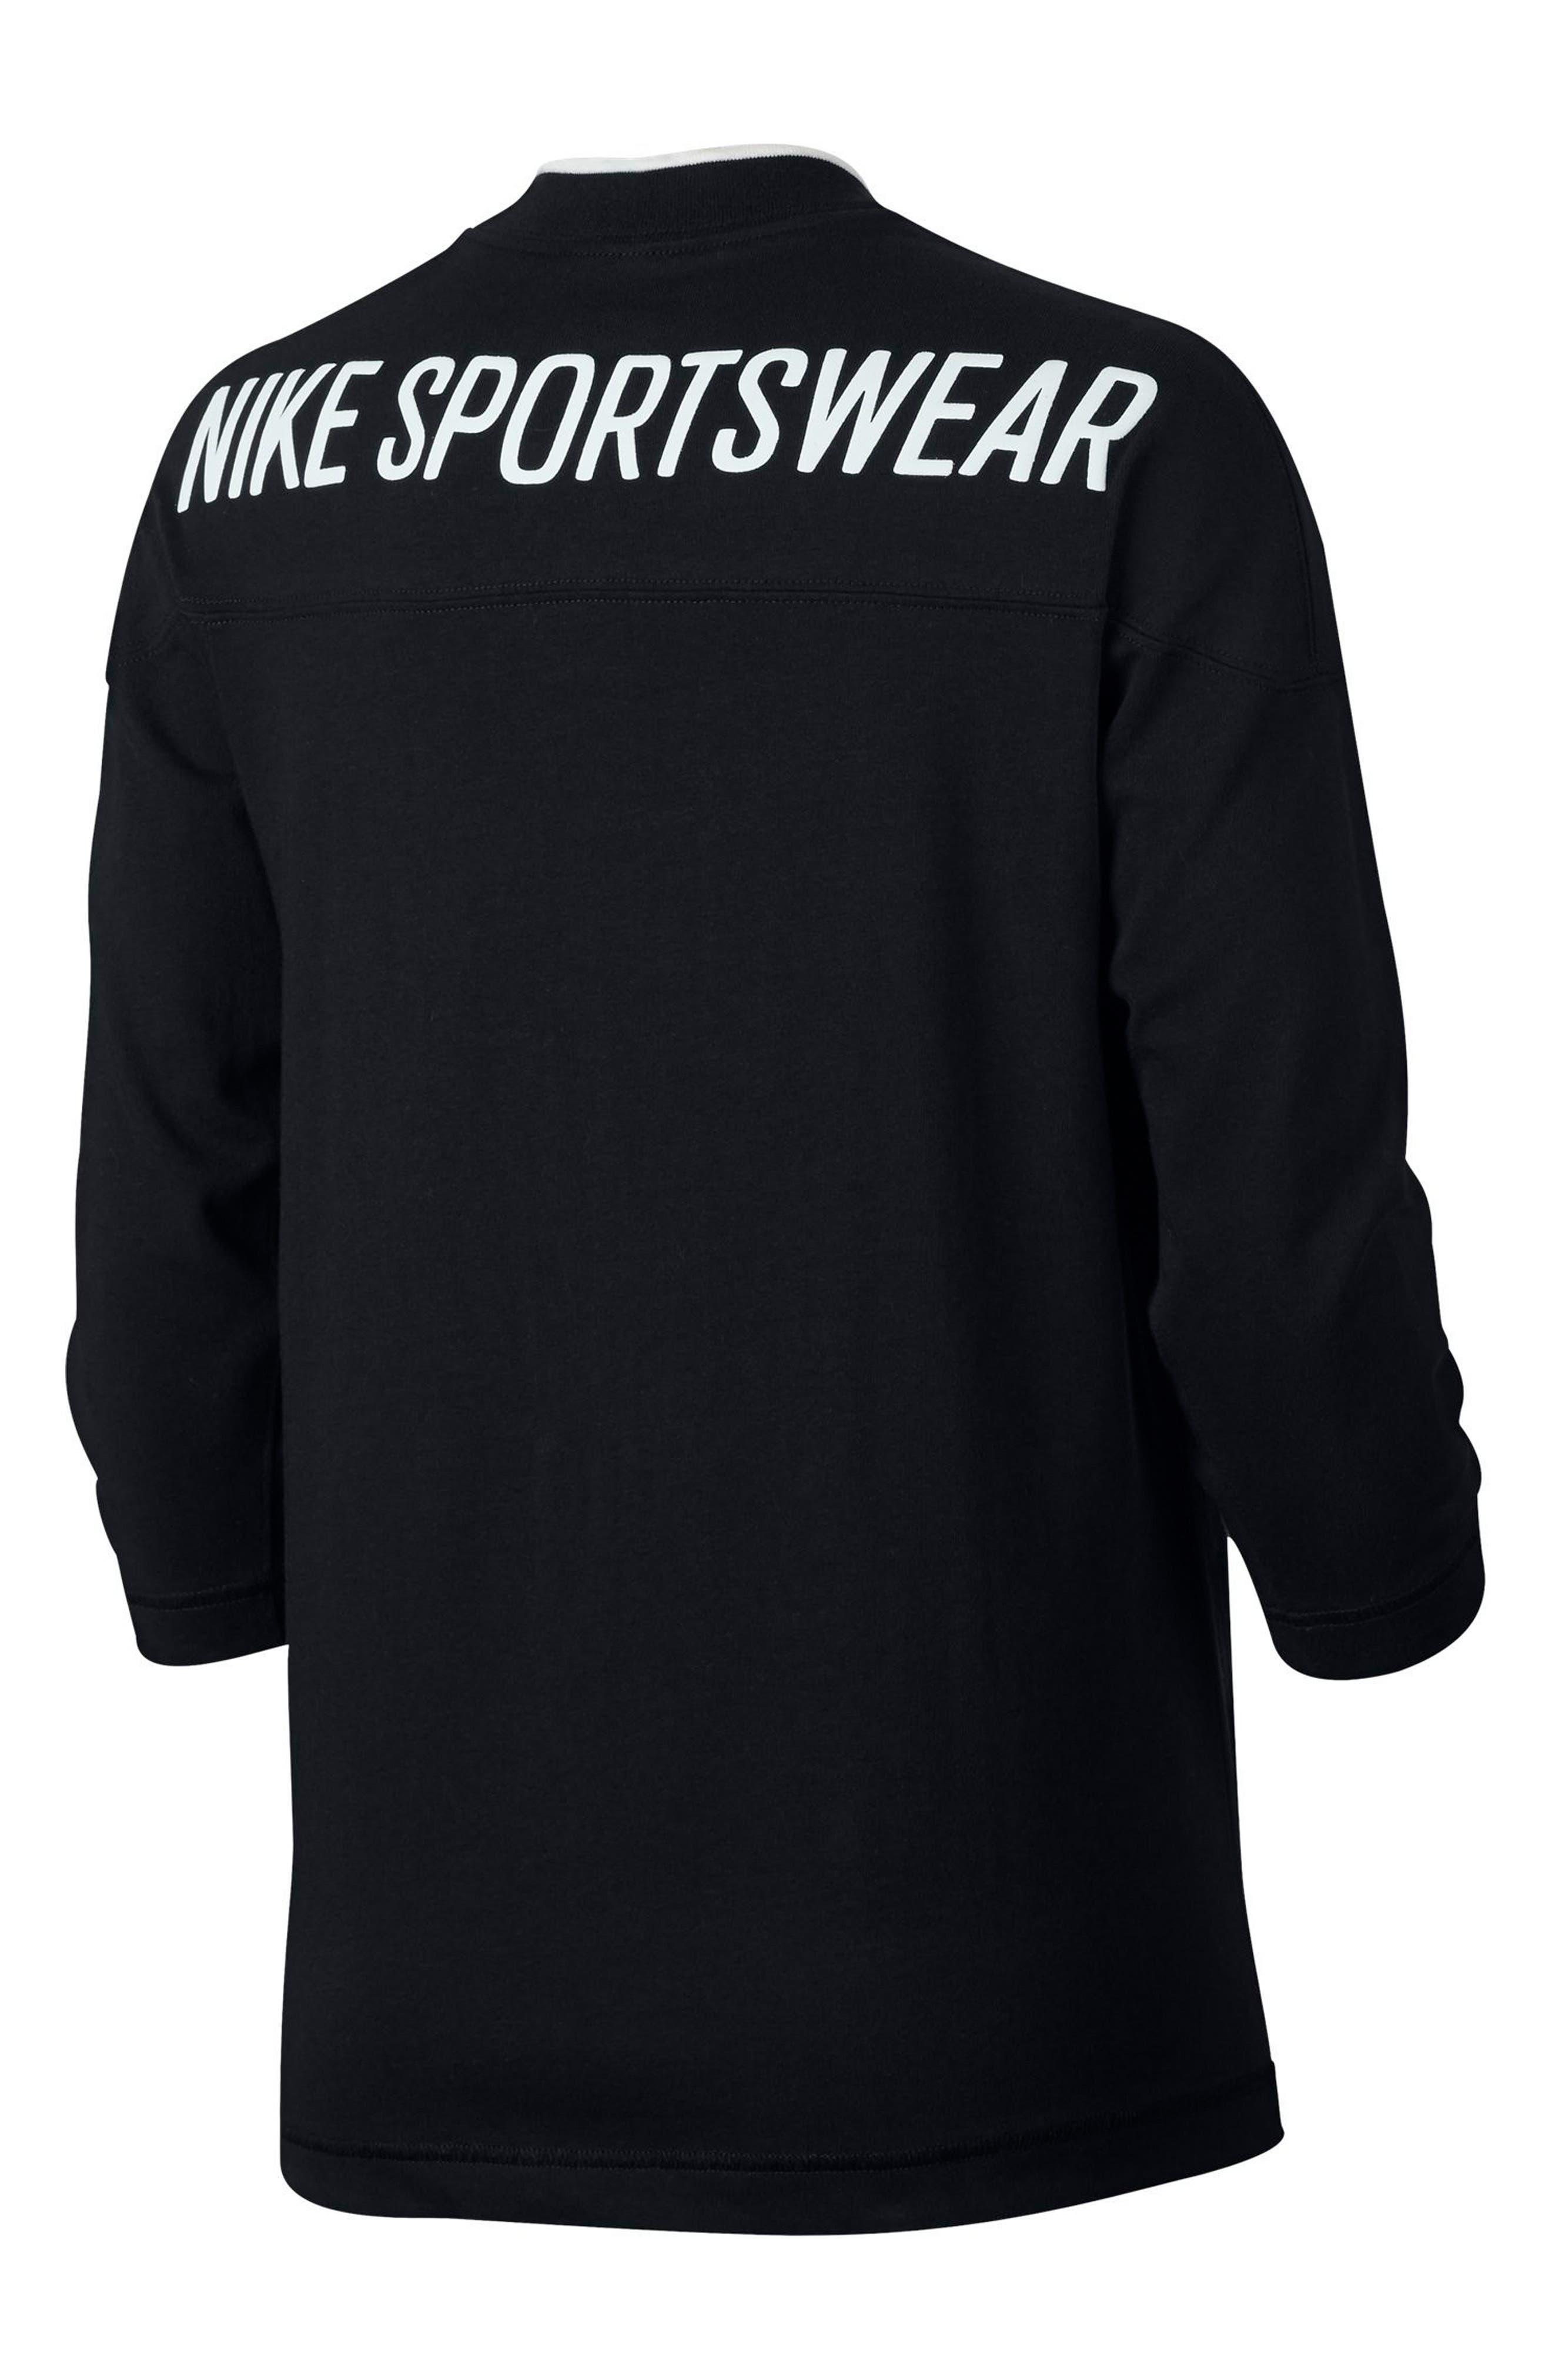 Sportswear Women's V-Neck Top,                             Alternate thumbnail 2, color,                             Black/ Sail